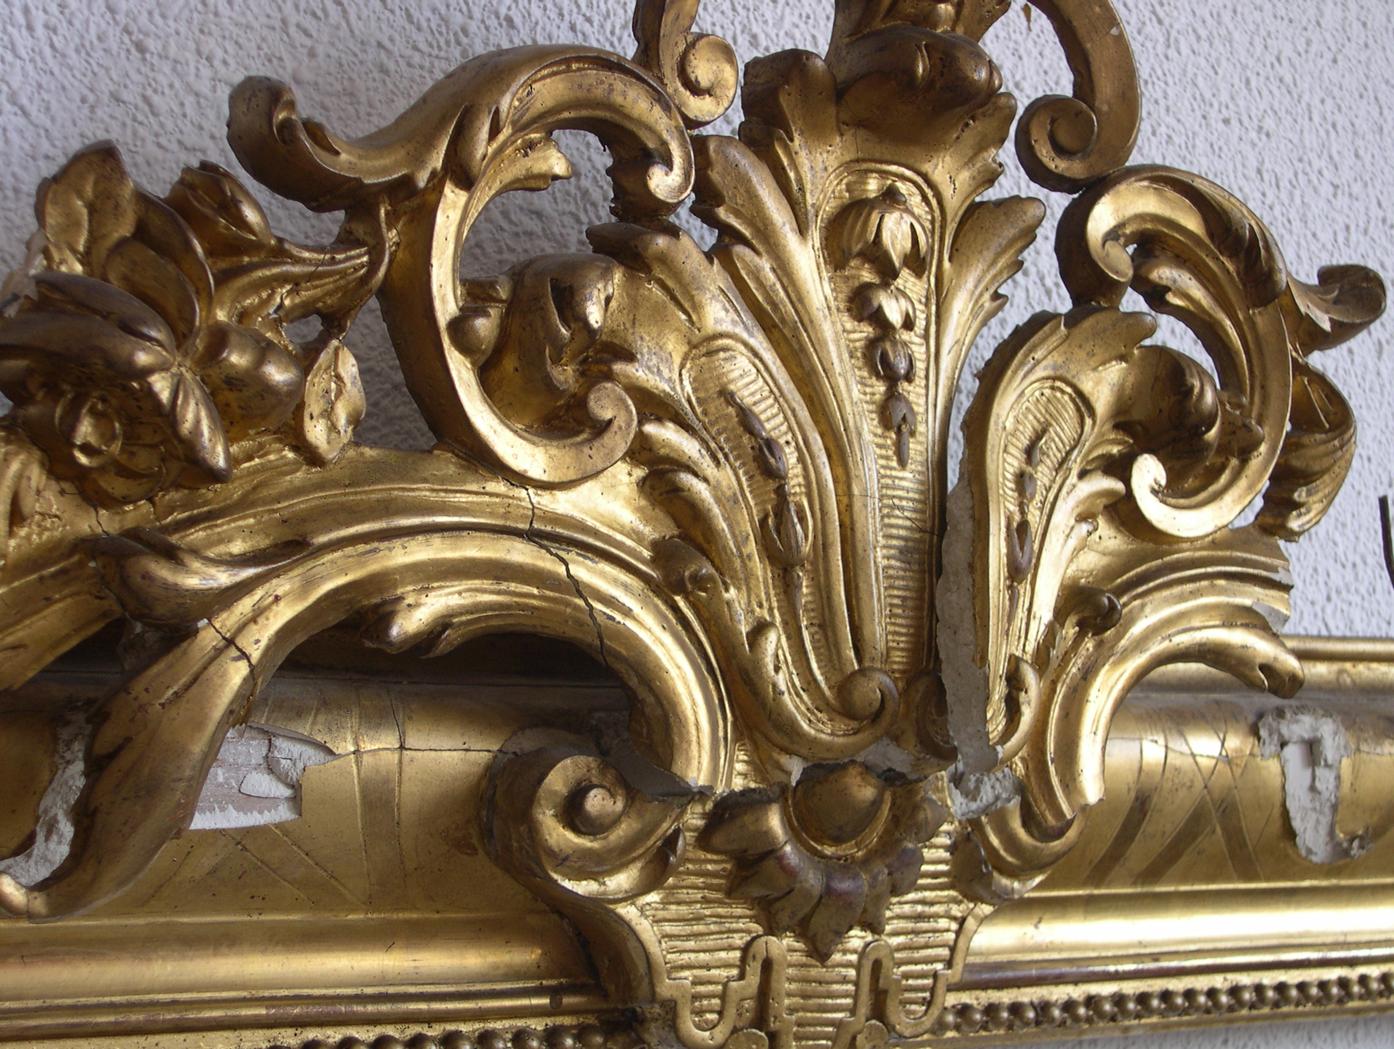 Marco dorado con espejo marco dorado de espejo detalle for Espejo marco dorado